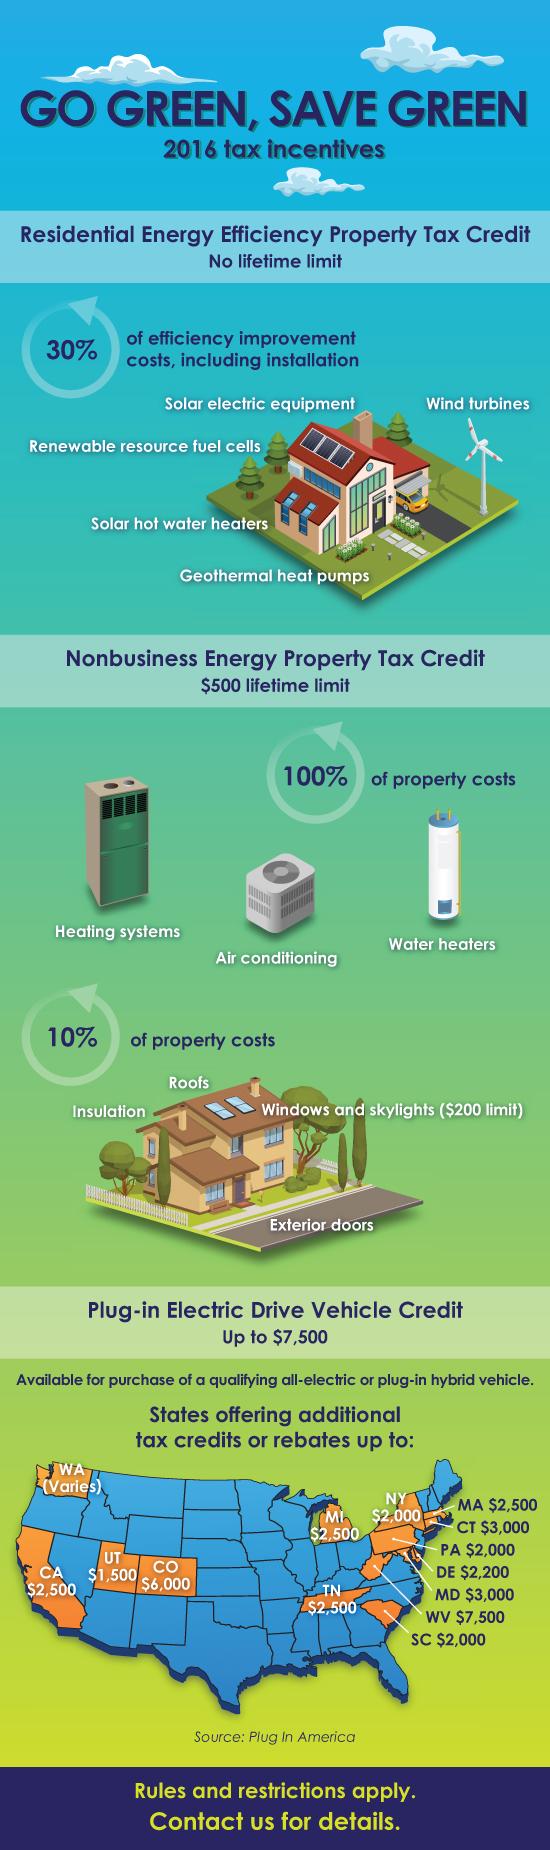 iff_energy-incentives_550x1850.jpg